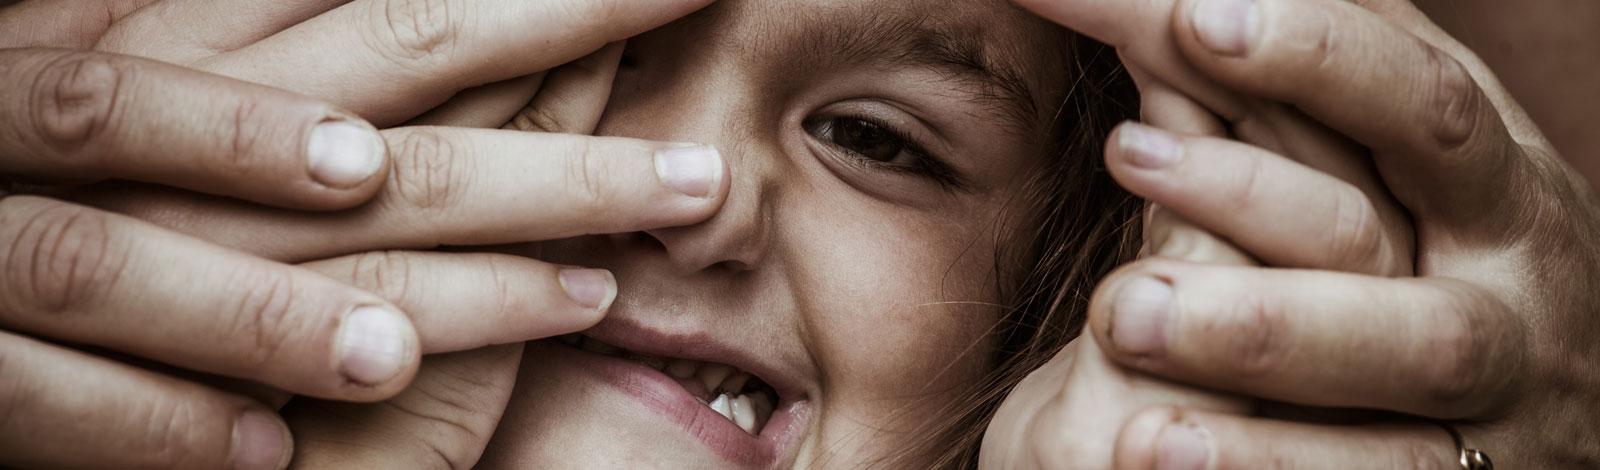 Texas Child Abuse Defense - Sindhu M. Alexander - Dallas Criminal Defense Attorney